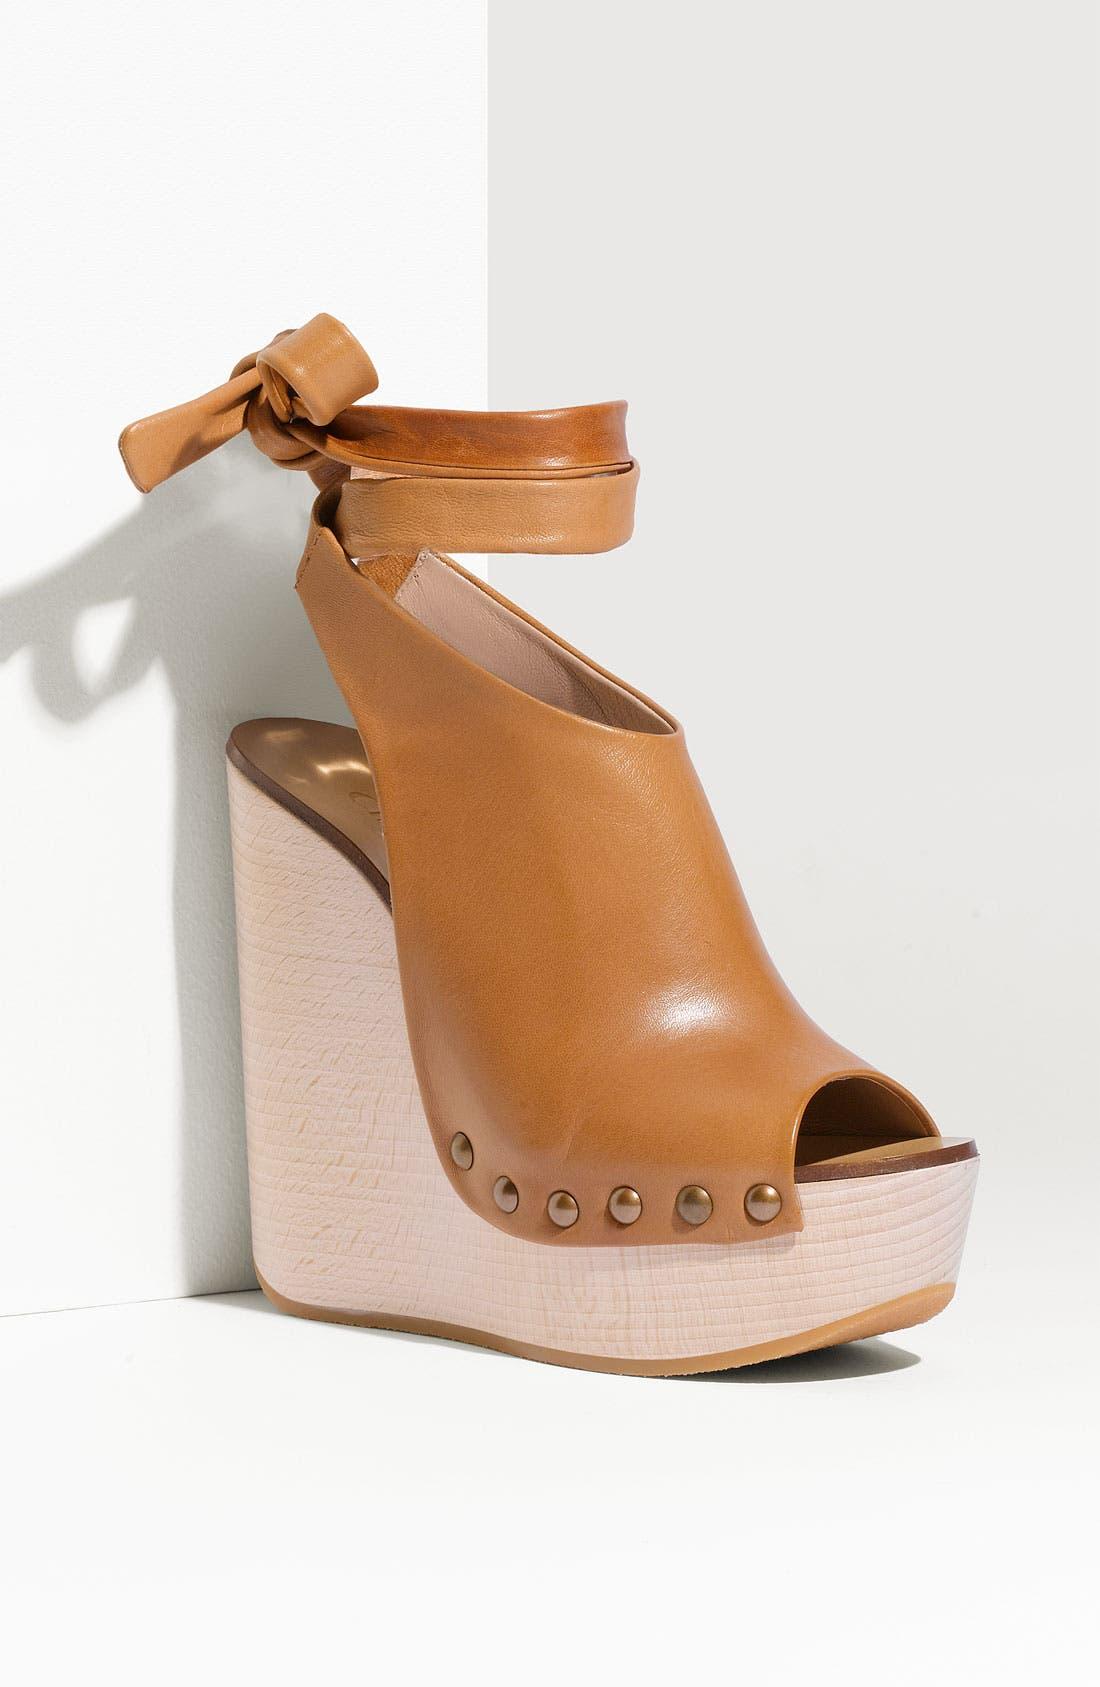 Alternate Image 1 Selected - Chloé 'Penelope' Wedge Sandal